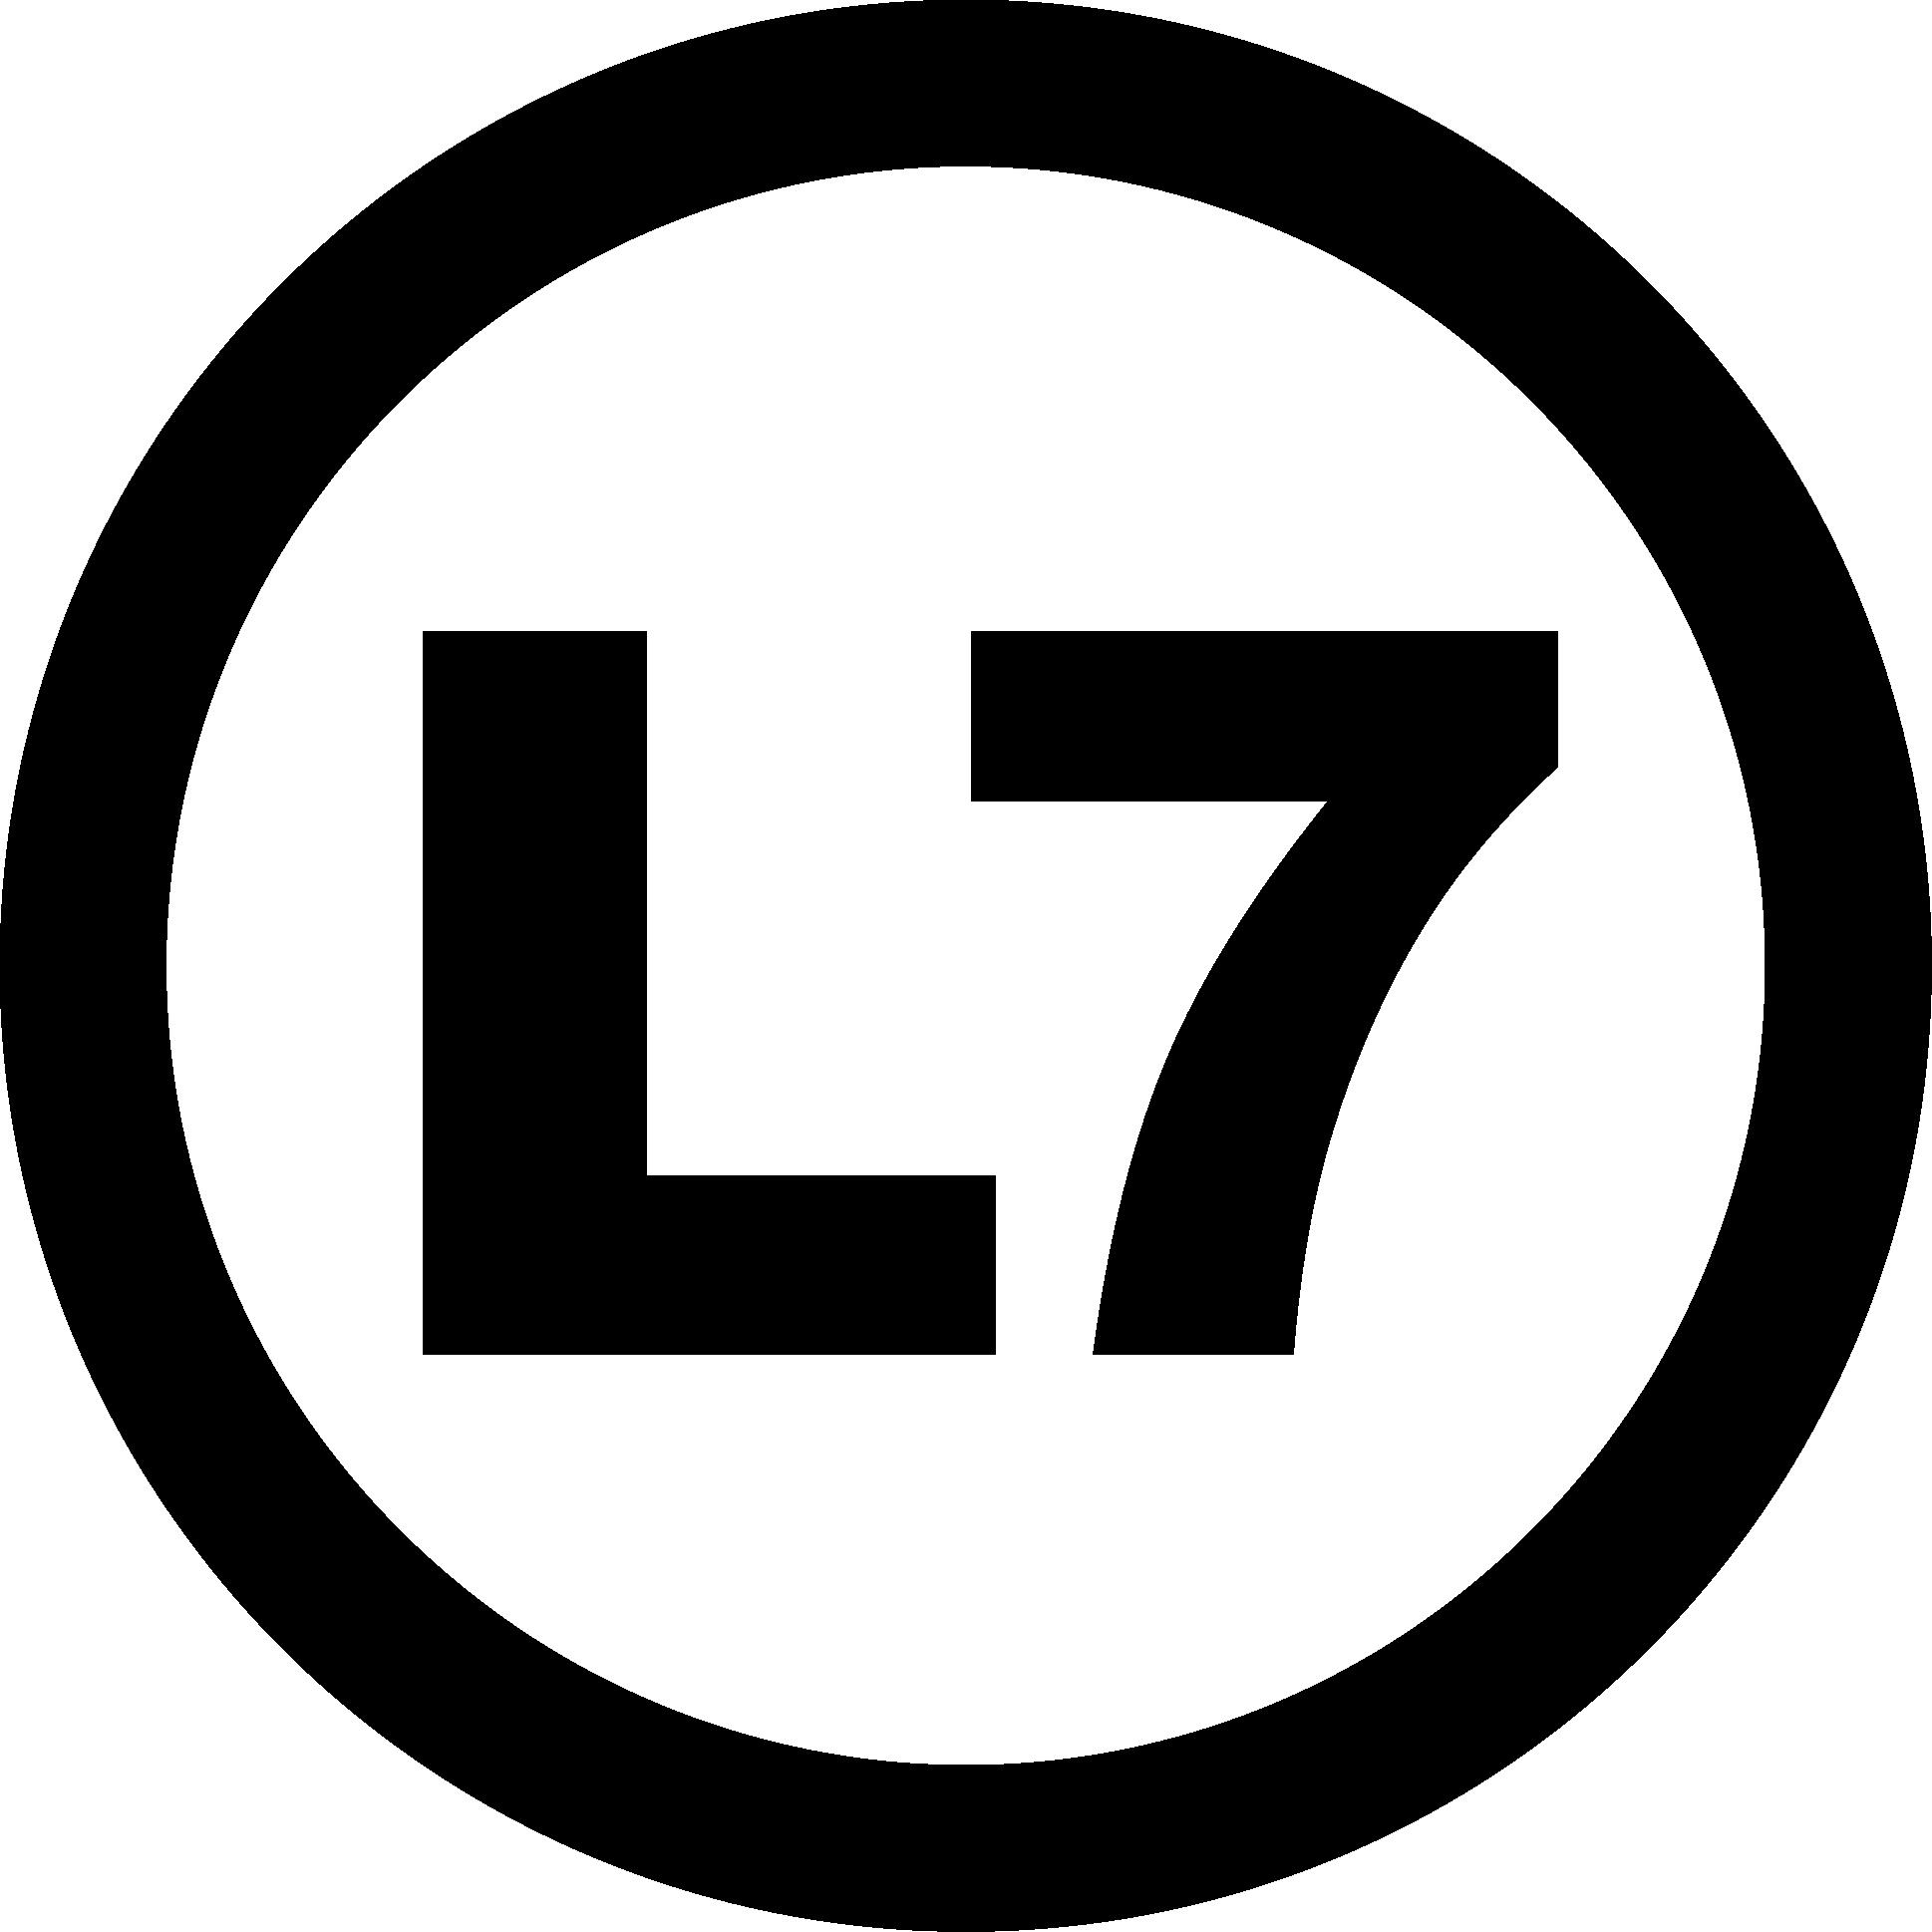 L7 logo png 3 » PNG Image.